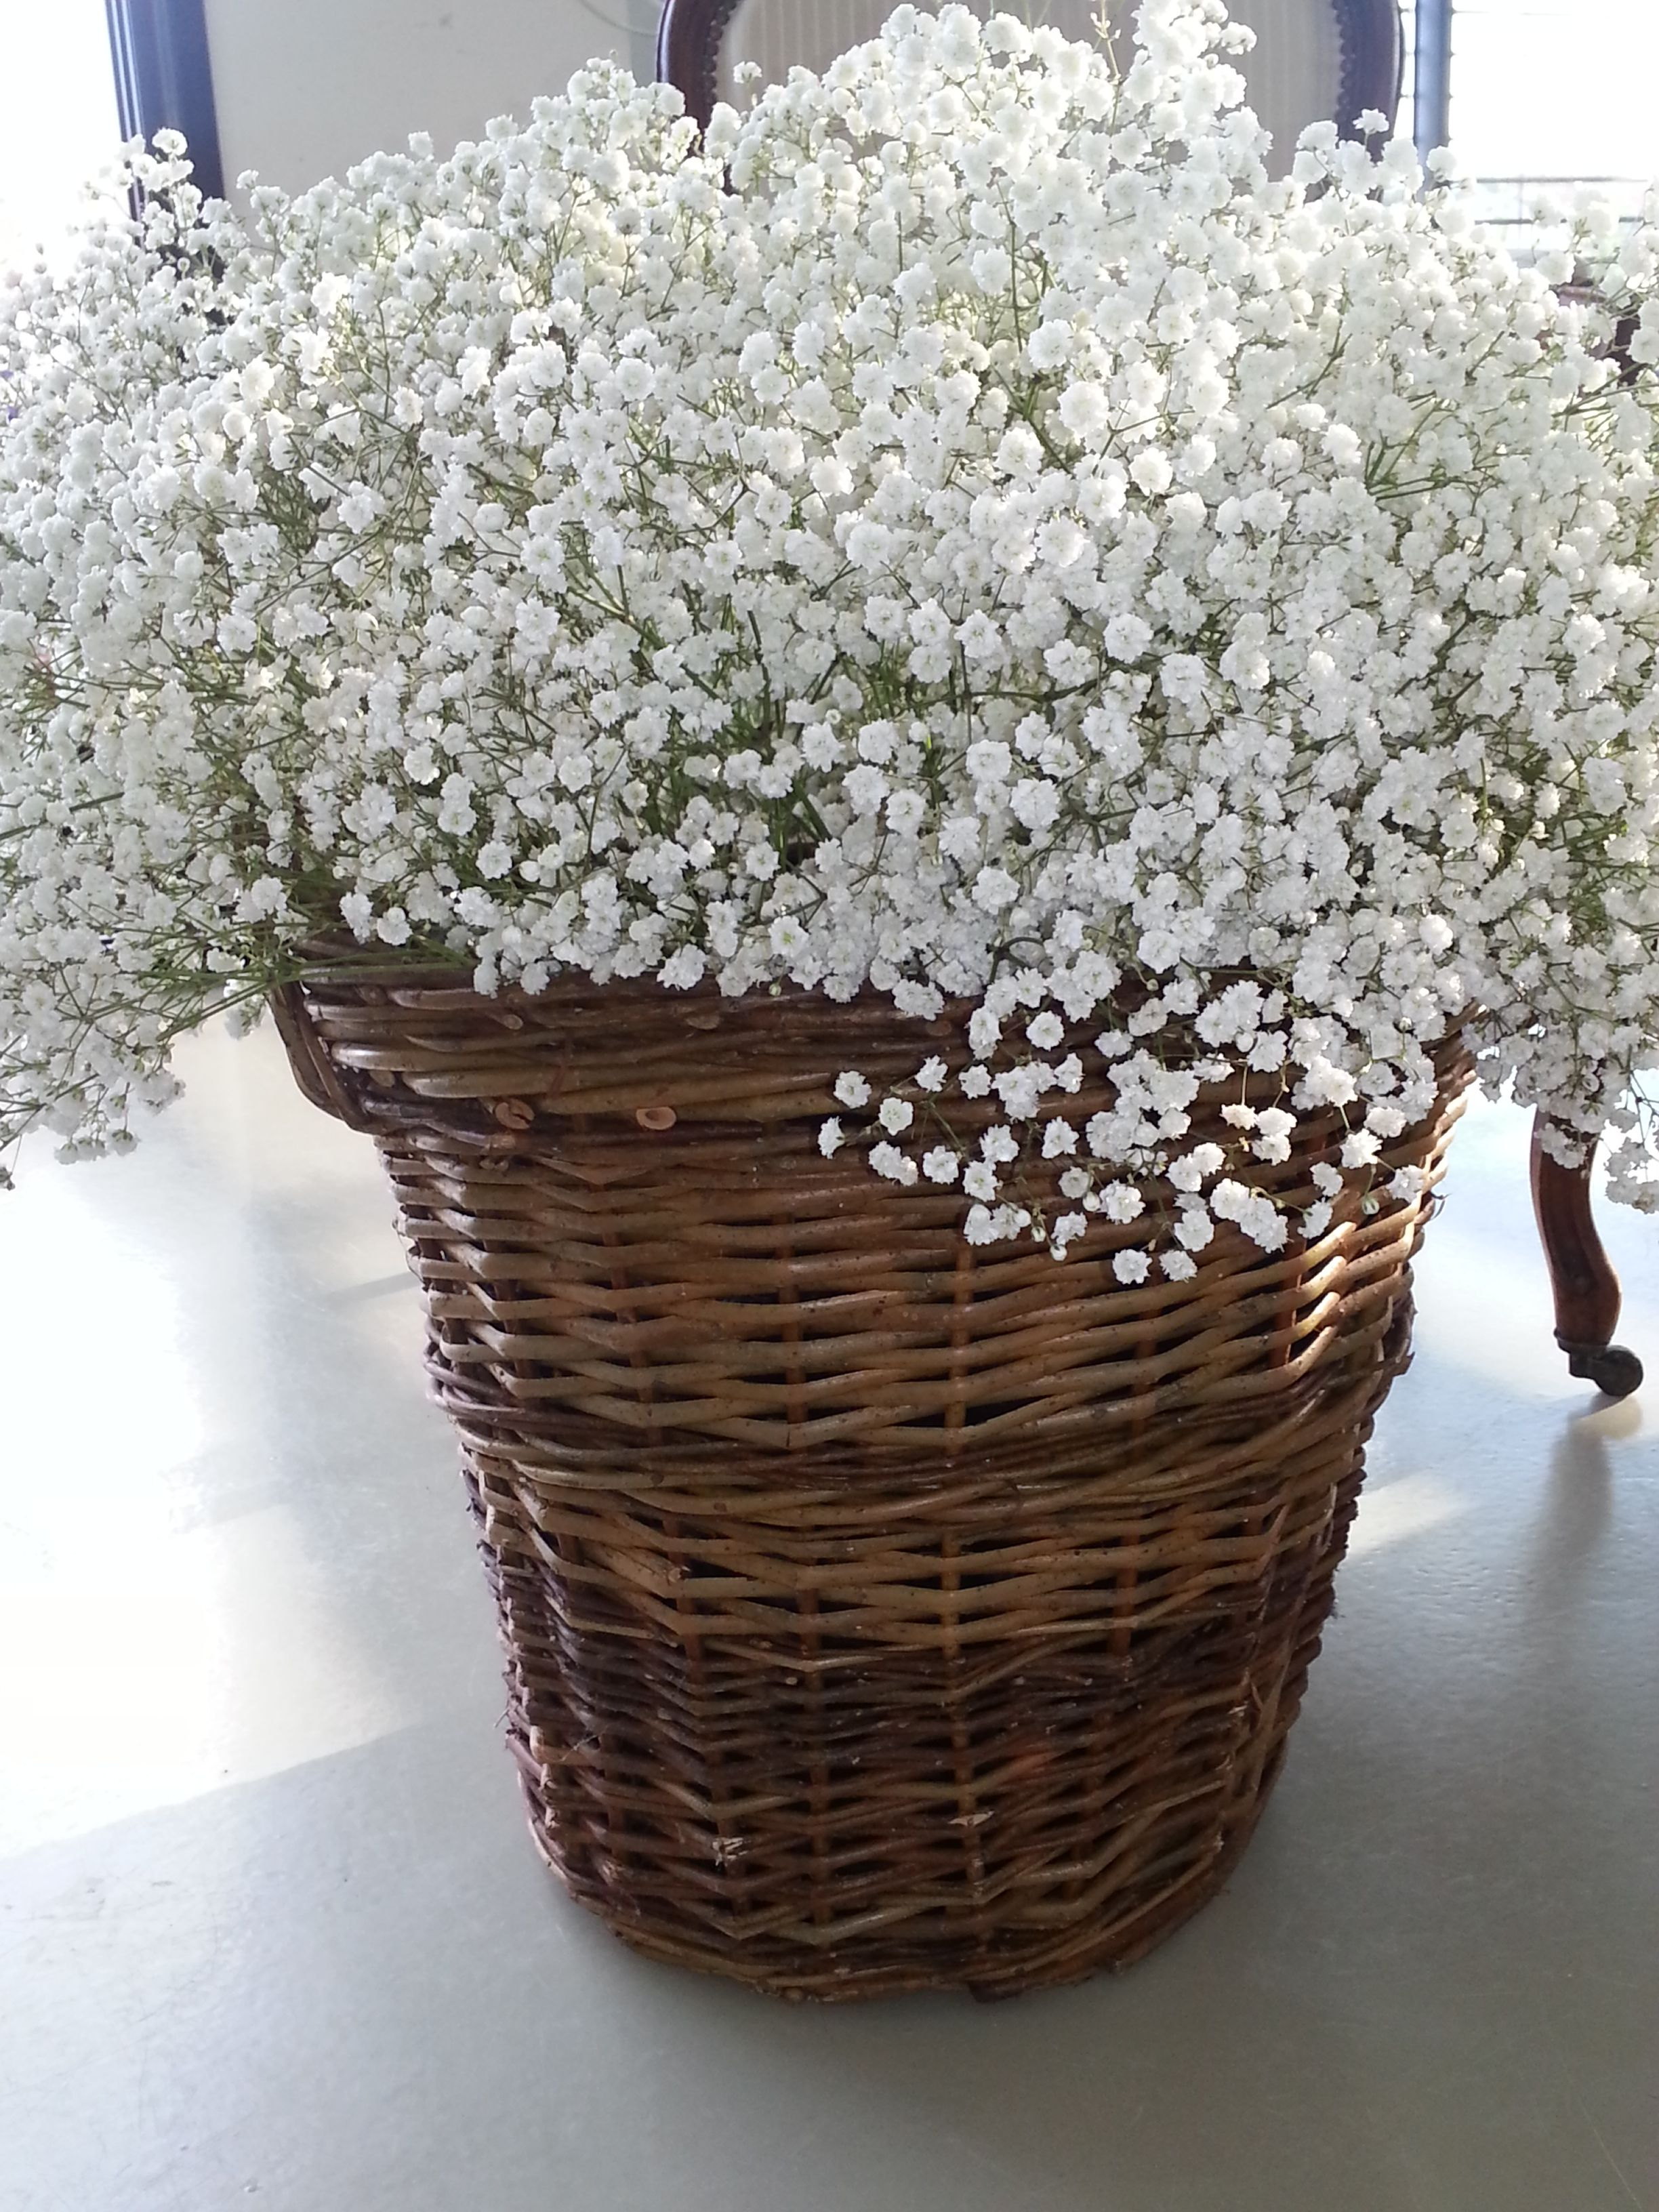 gypsophile dans panier en osier osier flowers babys. Black Bedroom Furniture Sets. Home Design Ideas